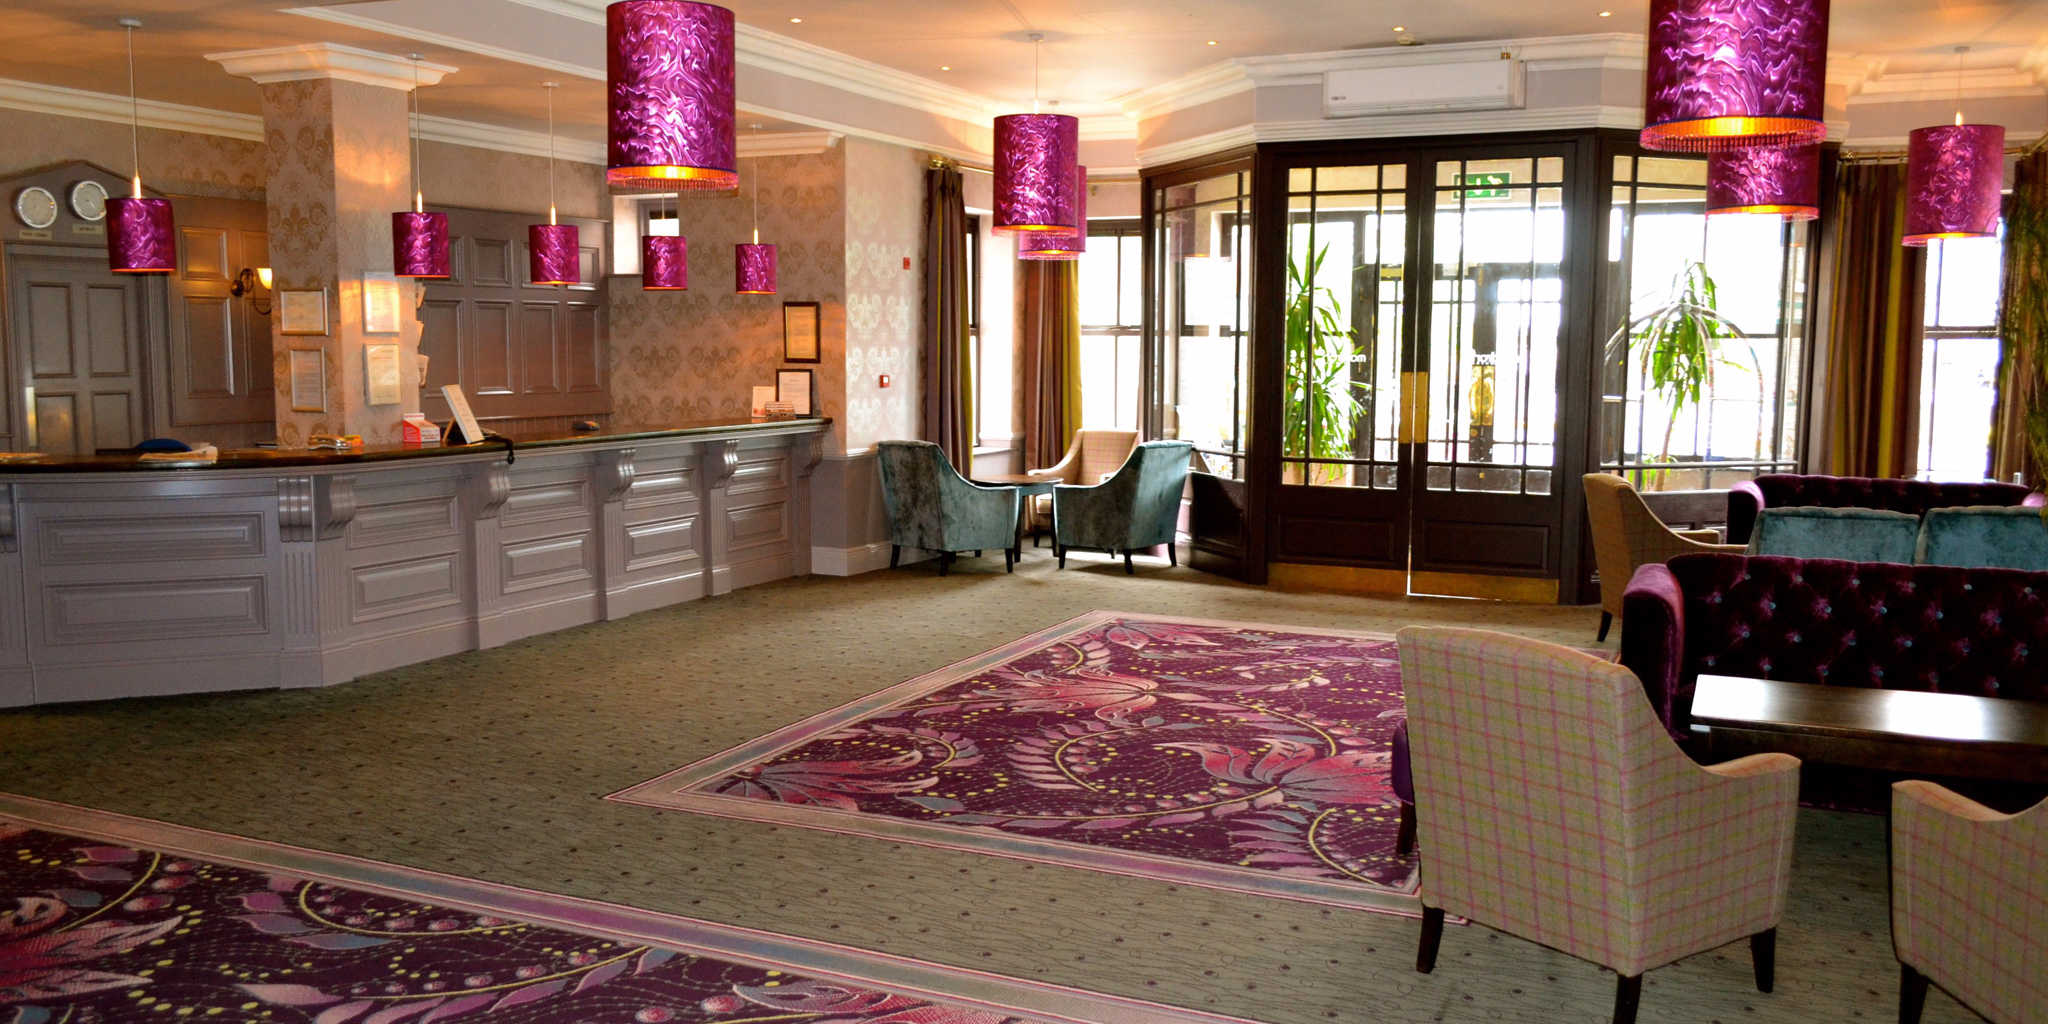 Superb 3 star accommodation galway maldron hotel galway hotel lobby galway wg solutioingenieria Choice Image